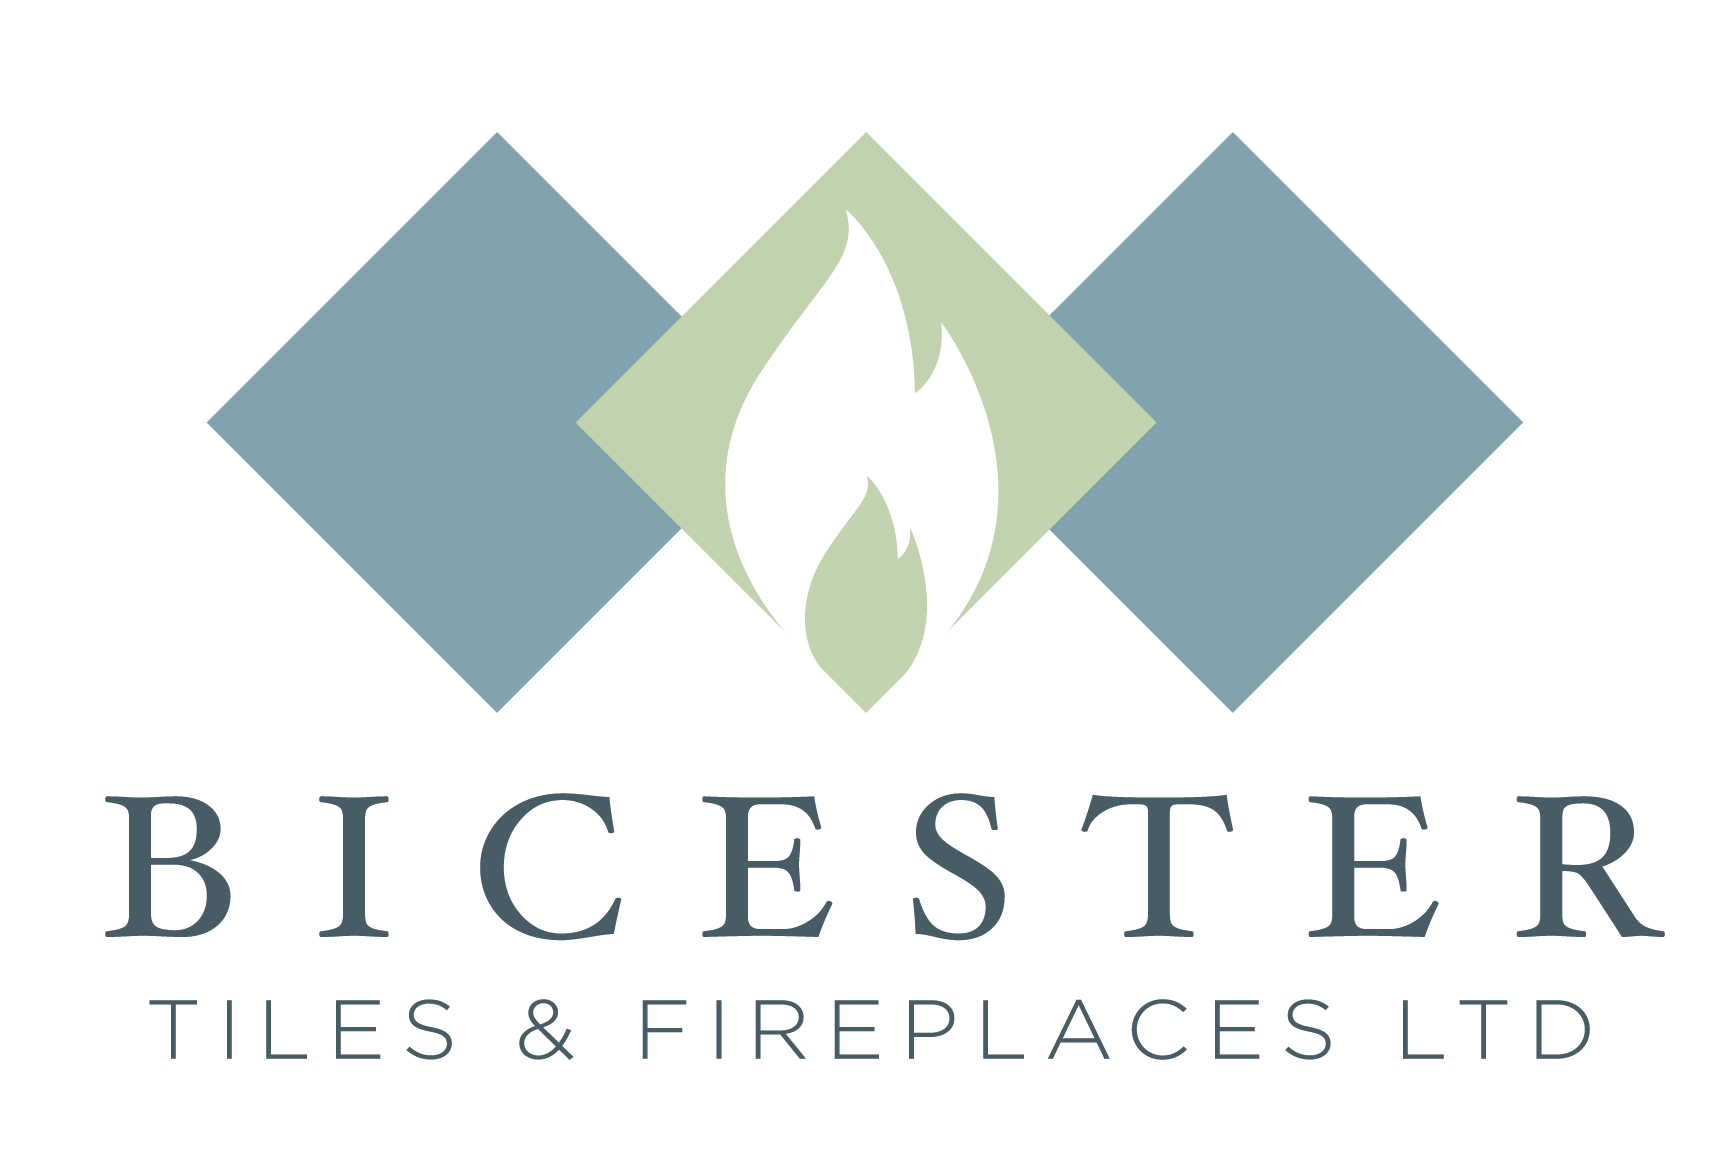 Bicester Tiles & Fireplaces Ltd.